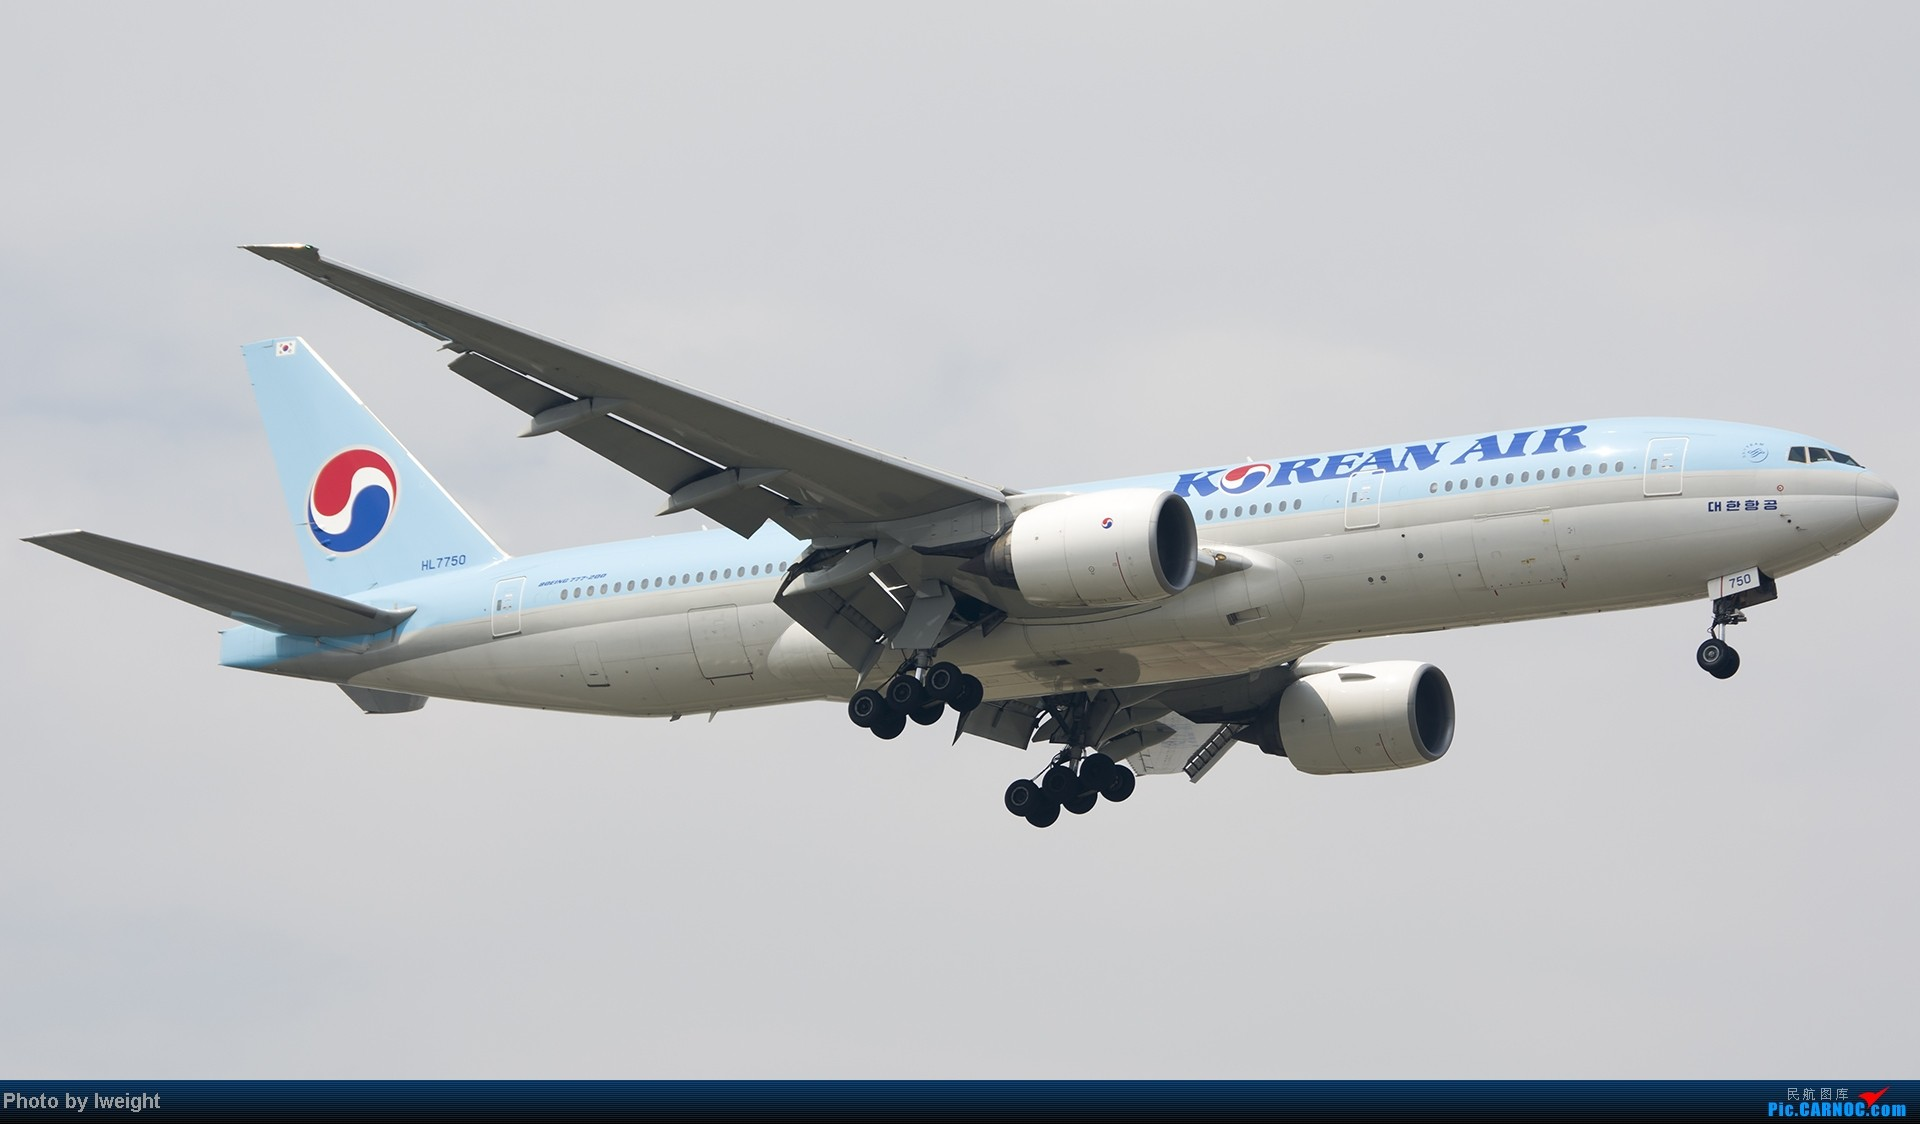 Re:[原创]休假无聊,跑道边来拍机玩(晚点的ZestAir、换装的B6100和刚交付的B2738等) BOEING 777-200 HL7750 中国北京首都机场